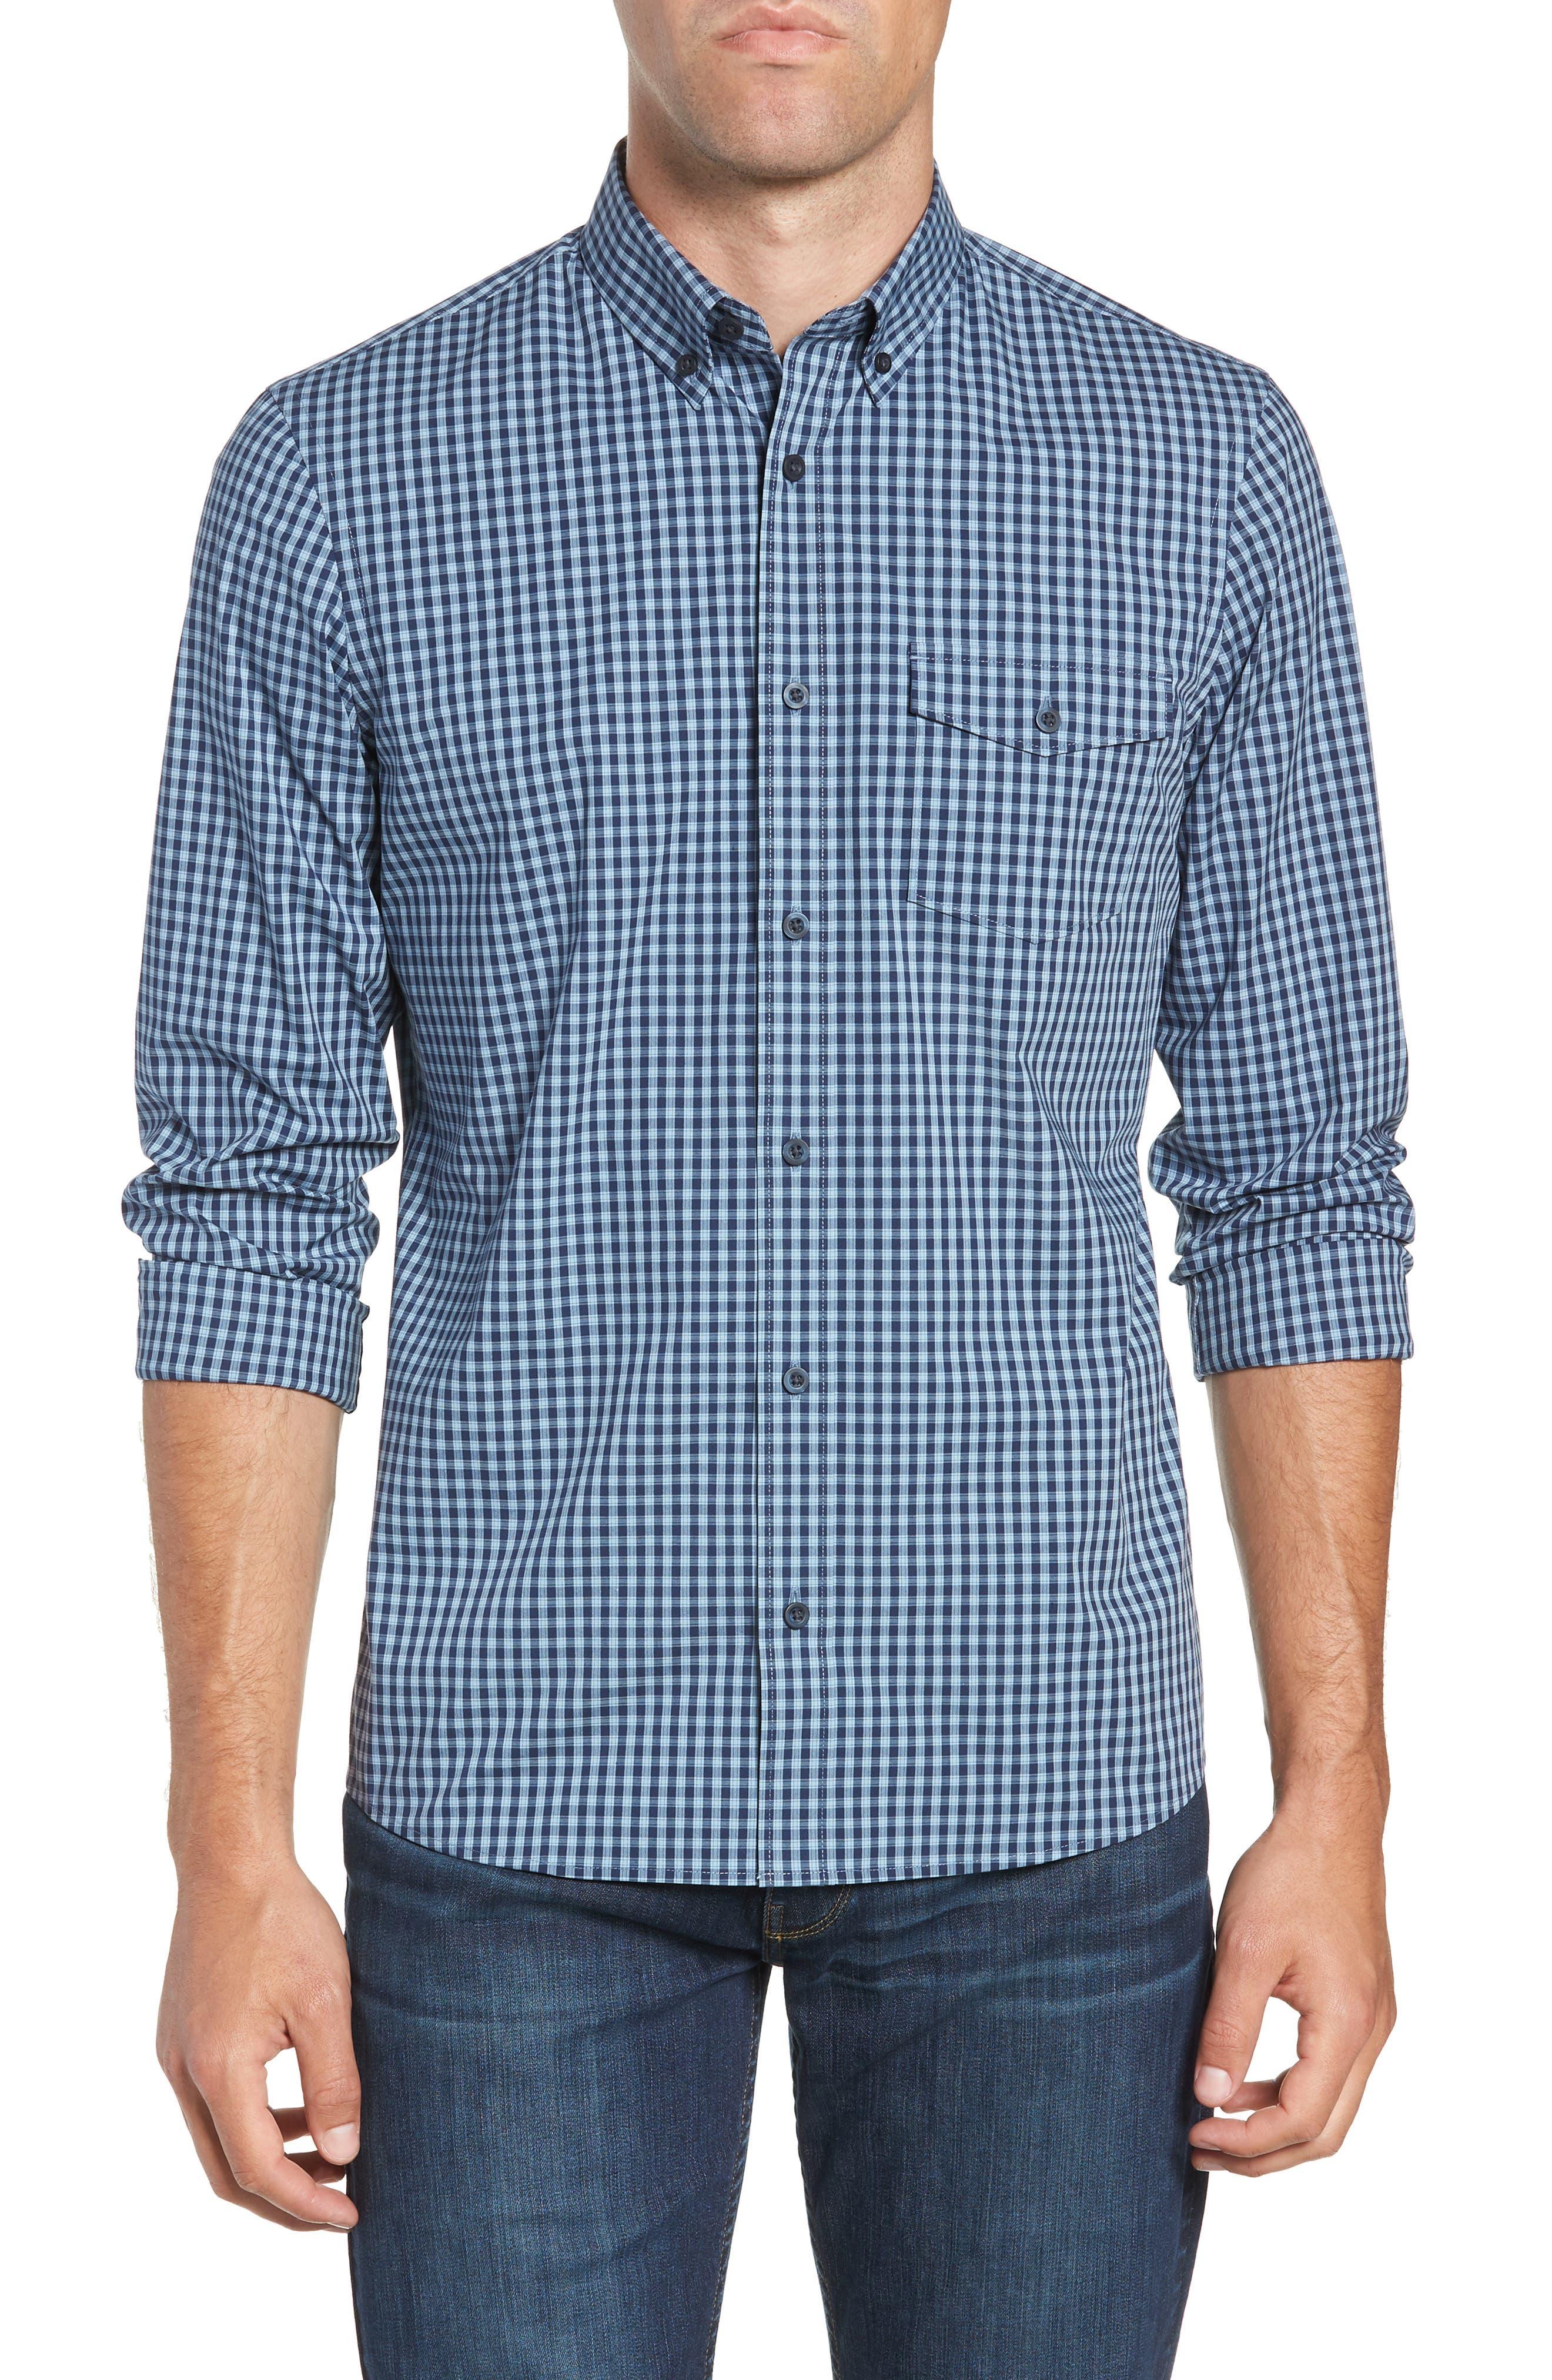 Tech-Smart Slim Fit Check Sport Shirt,                             Main thumbnail 1, color,                             NAVY NIGHT BLUE CHECK